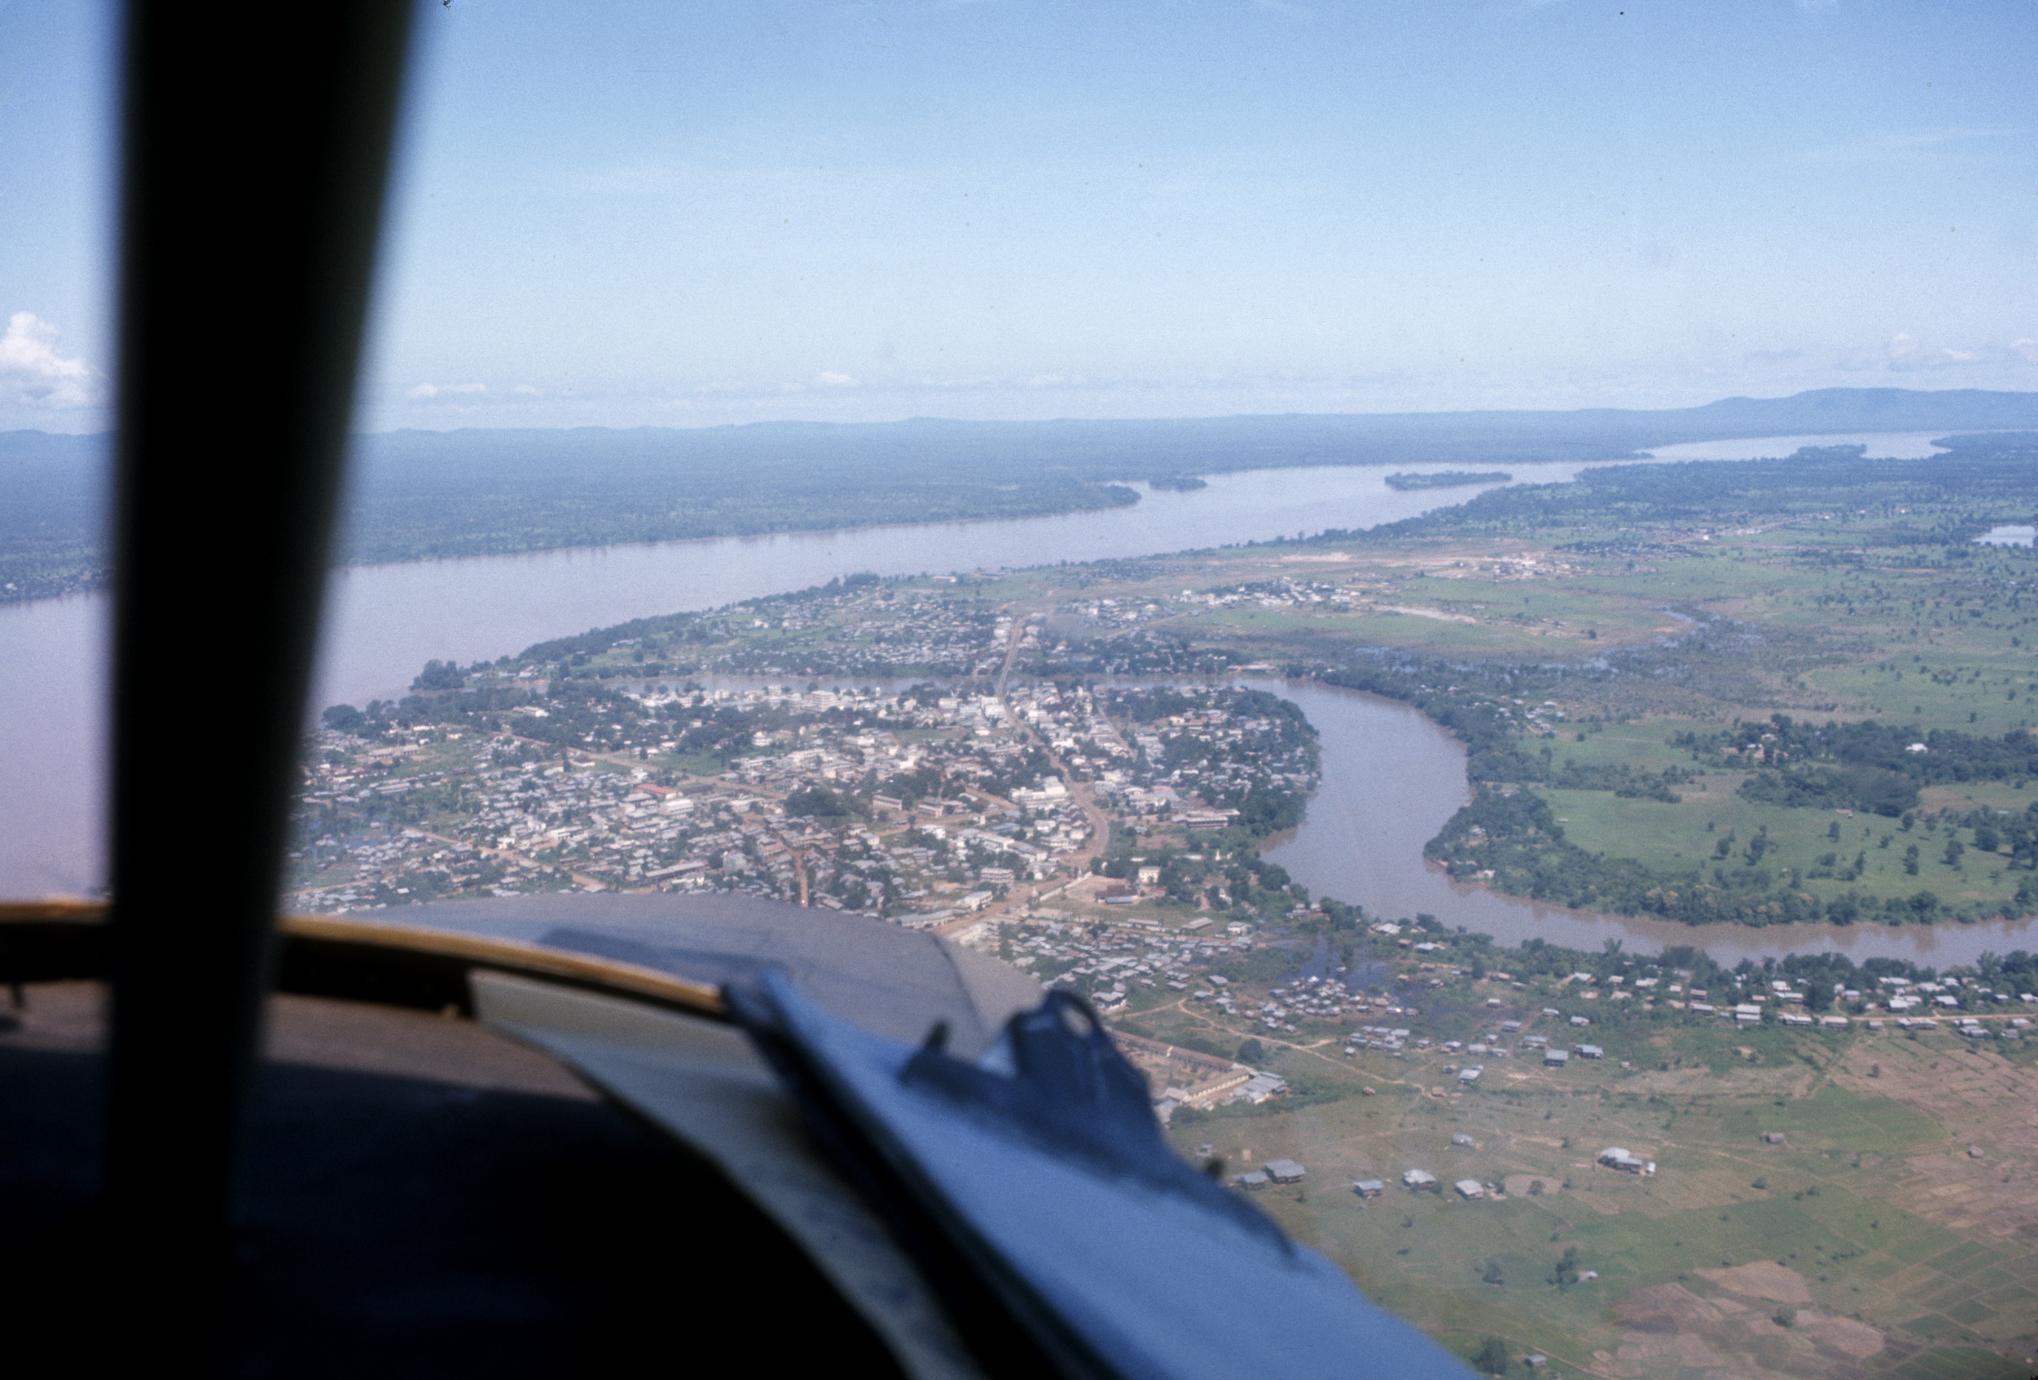 Aerial view of Pakse